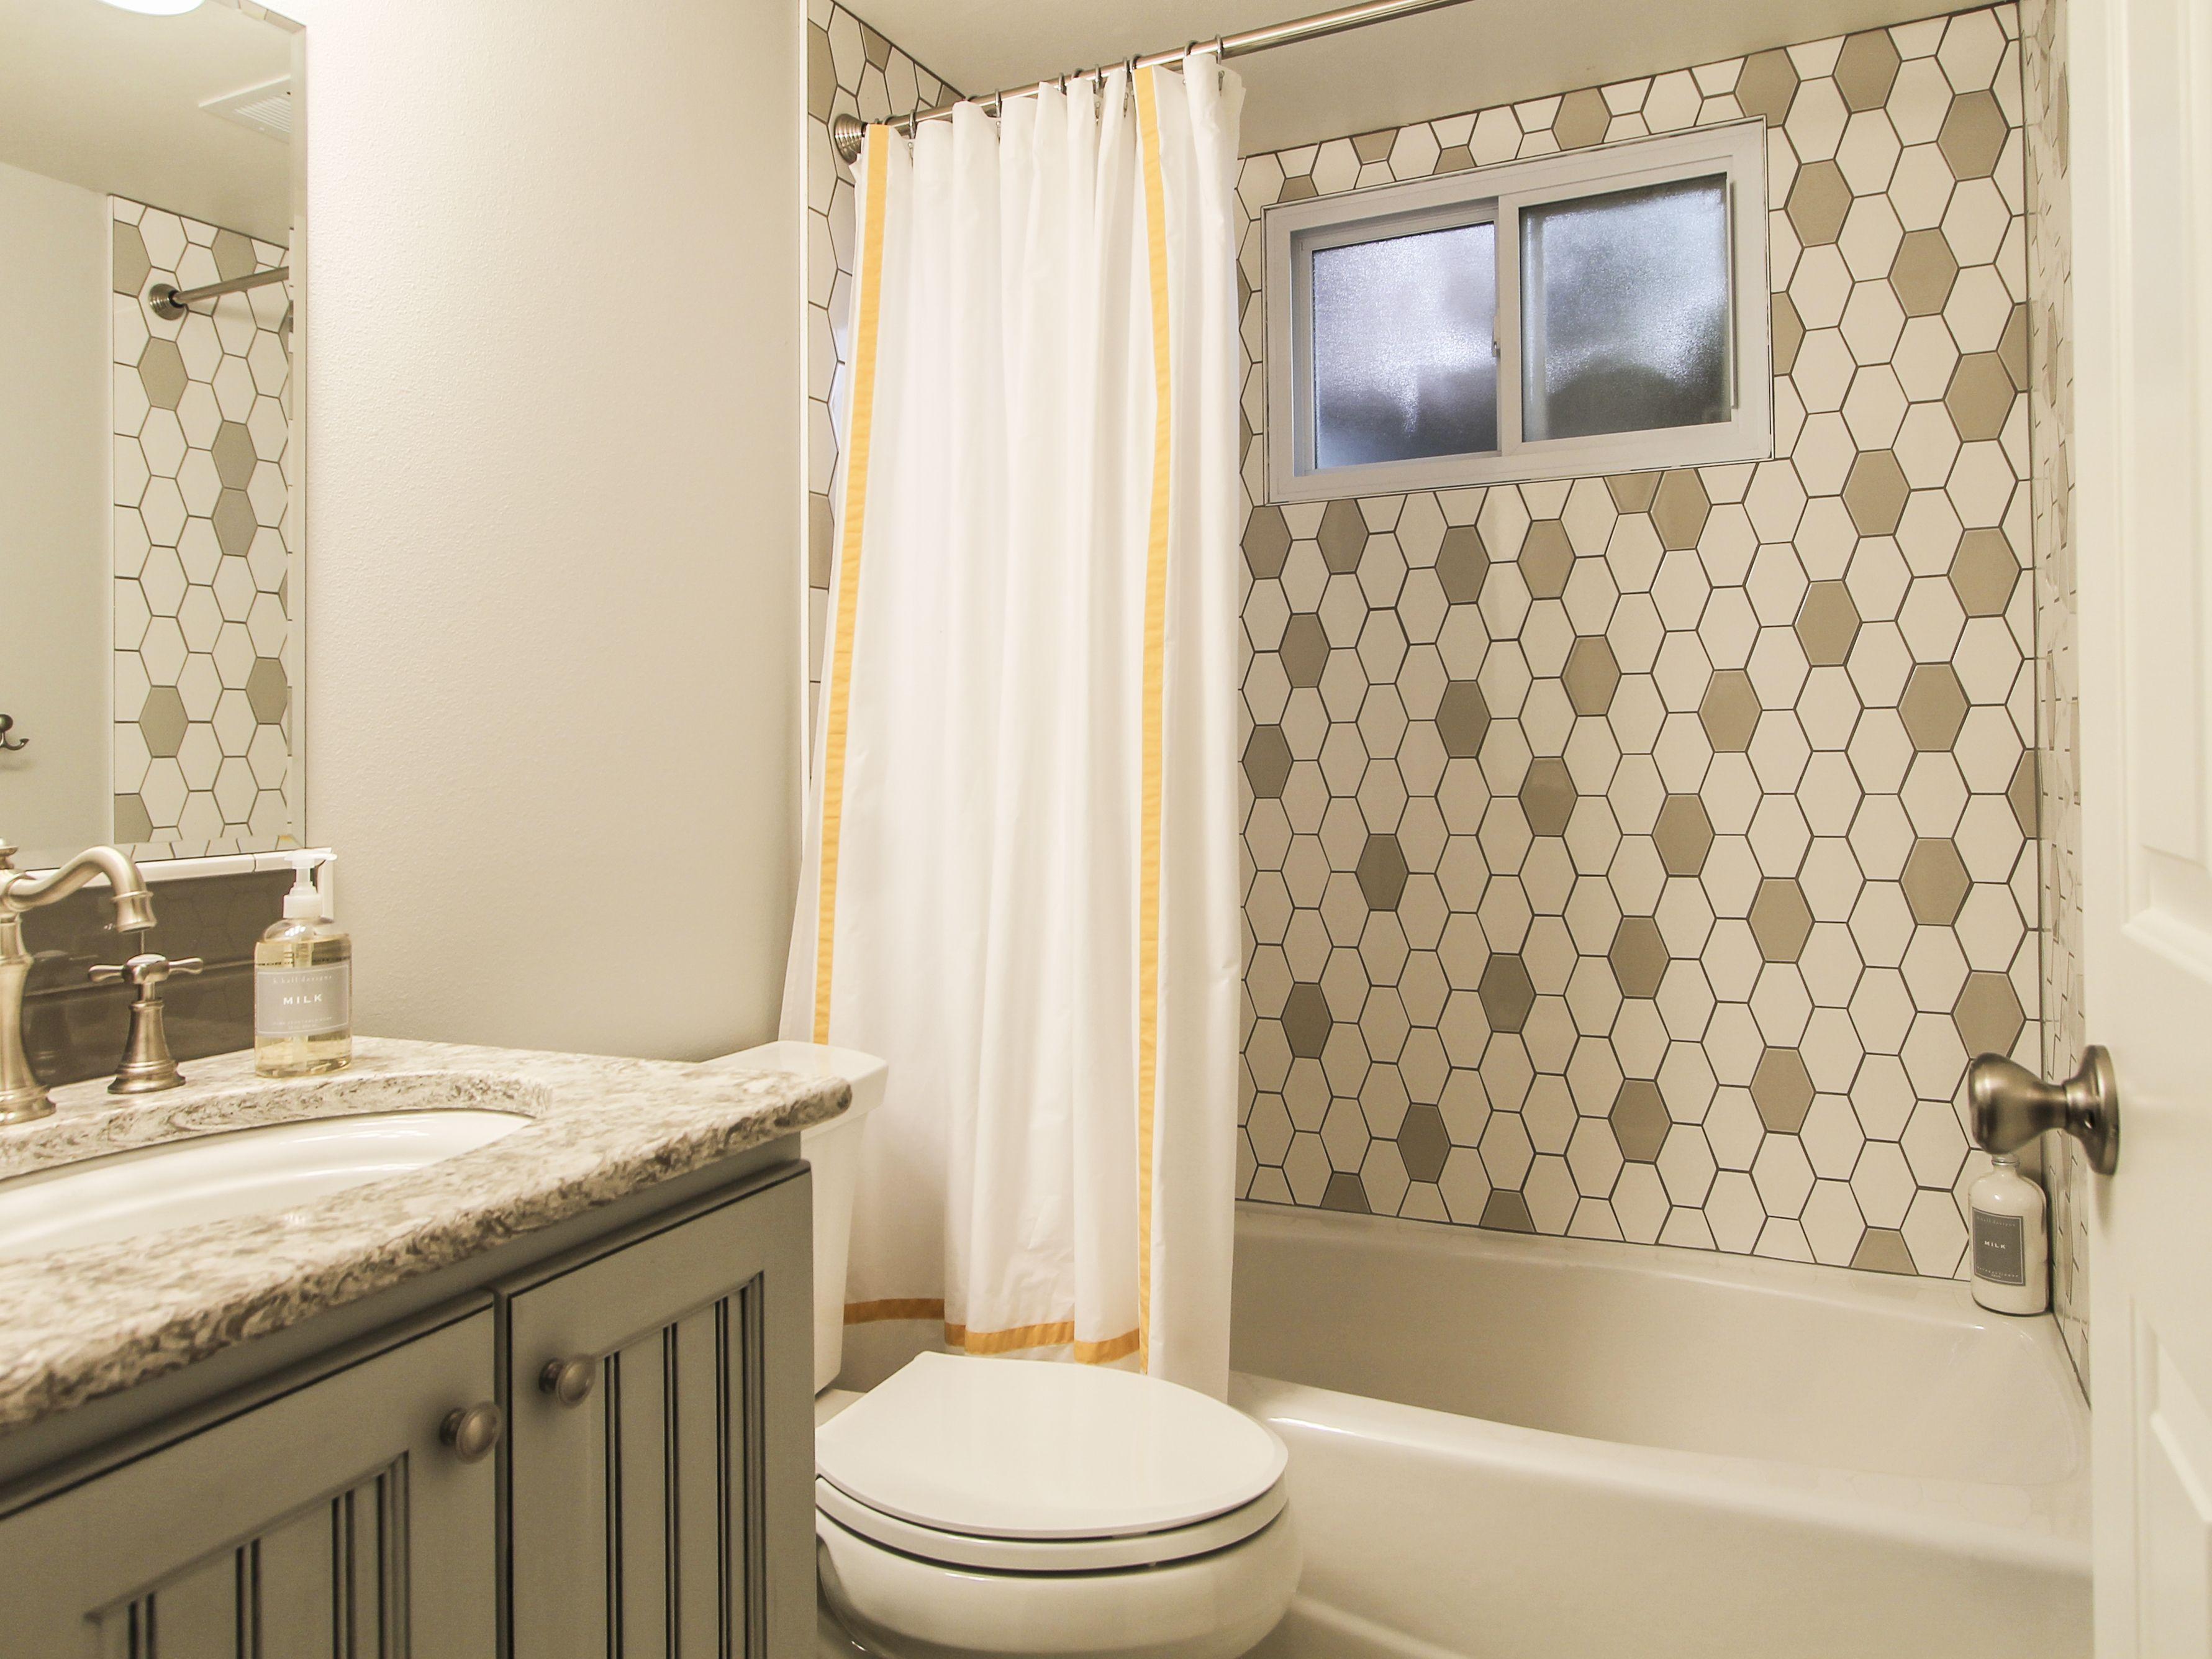 Basement Bathroom Remodel In Historic Home Bathrooms Pinterest - Bathroom remodel fort collins